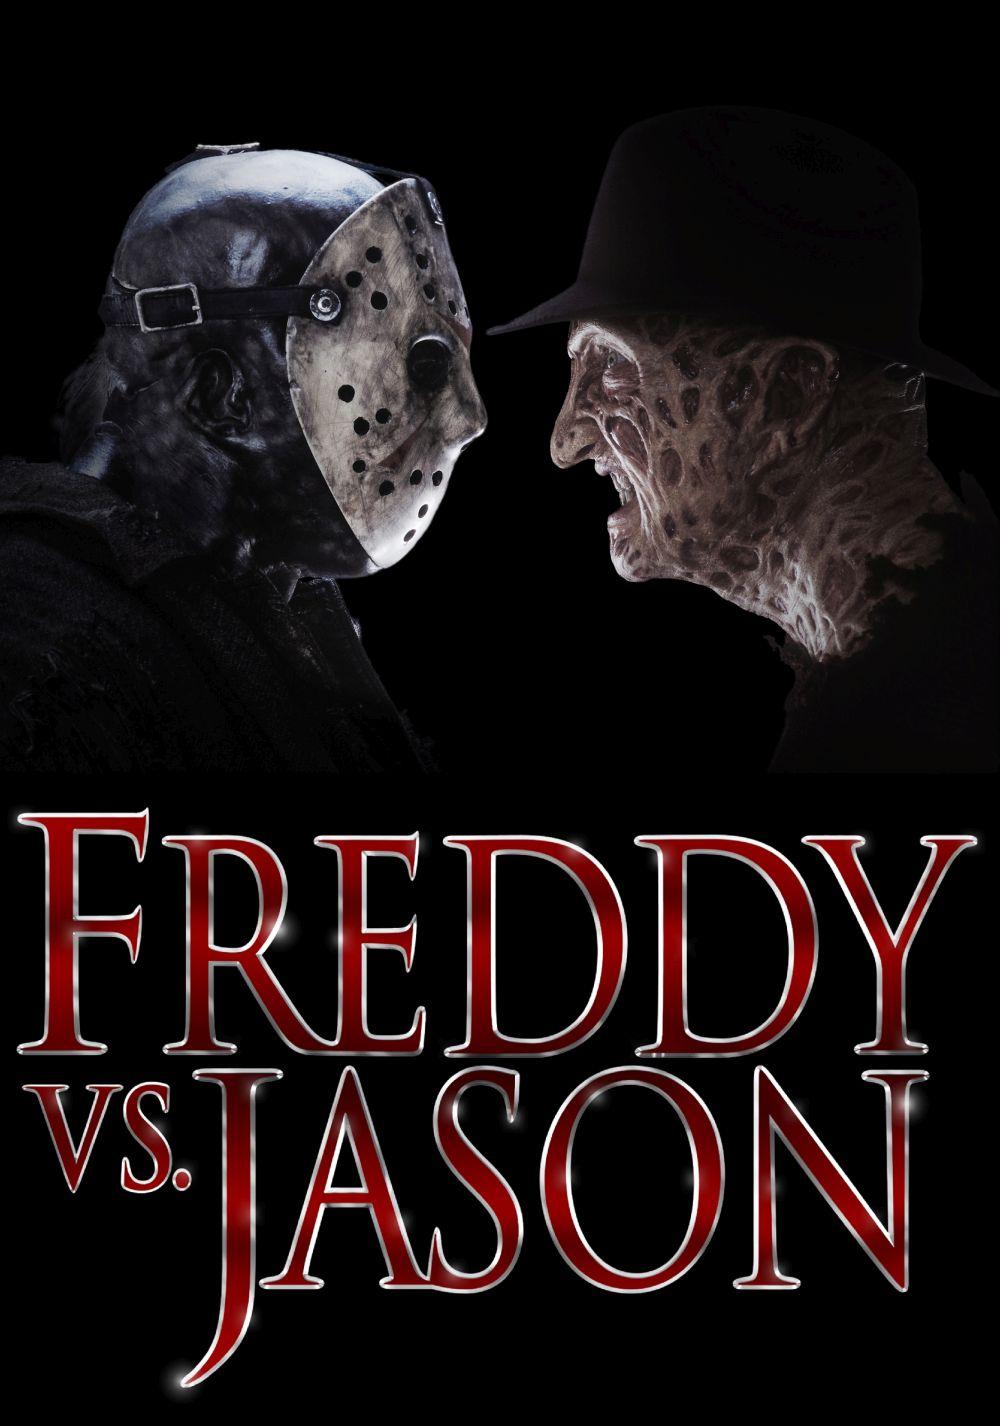 freddy vs jason hd full movie